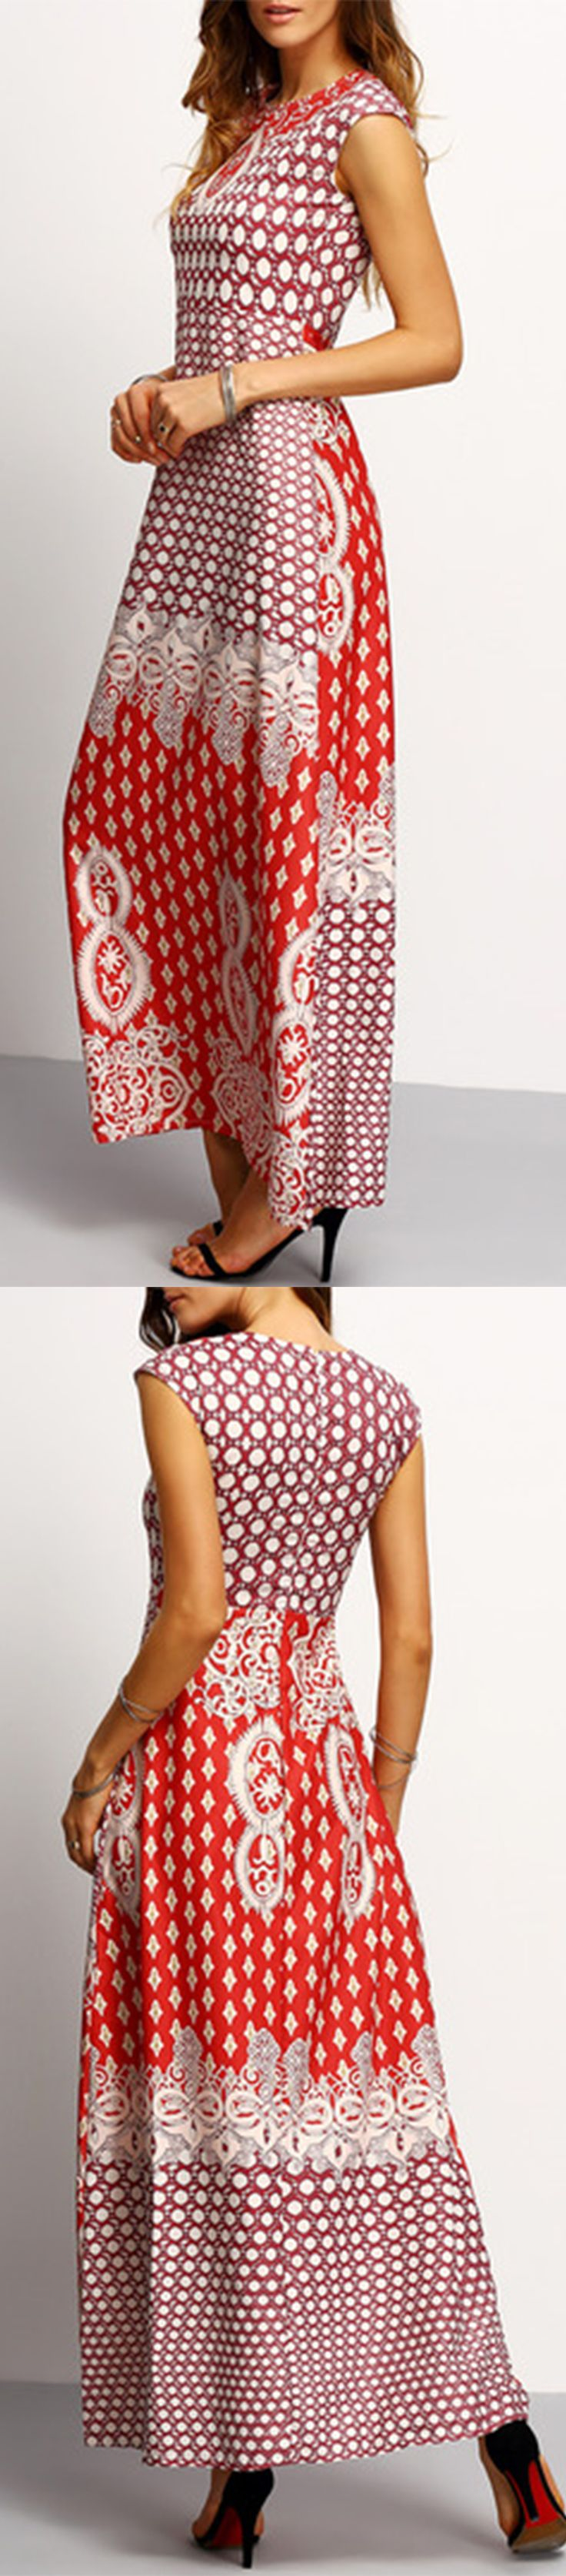 maxi dress vintage style end tables